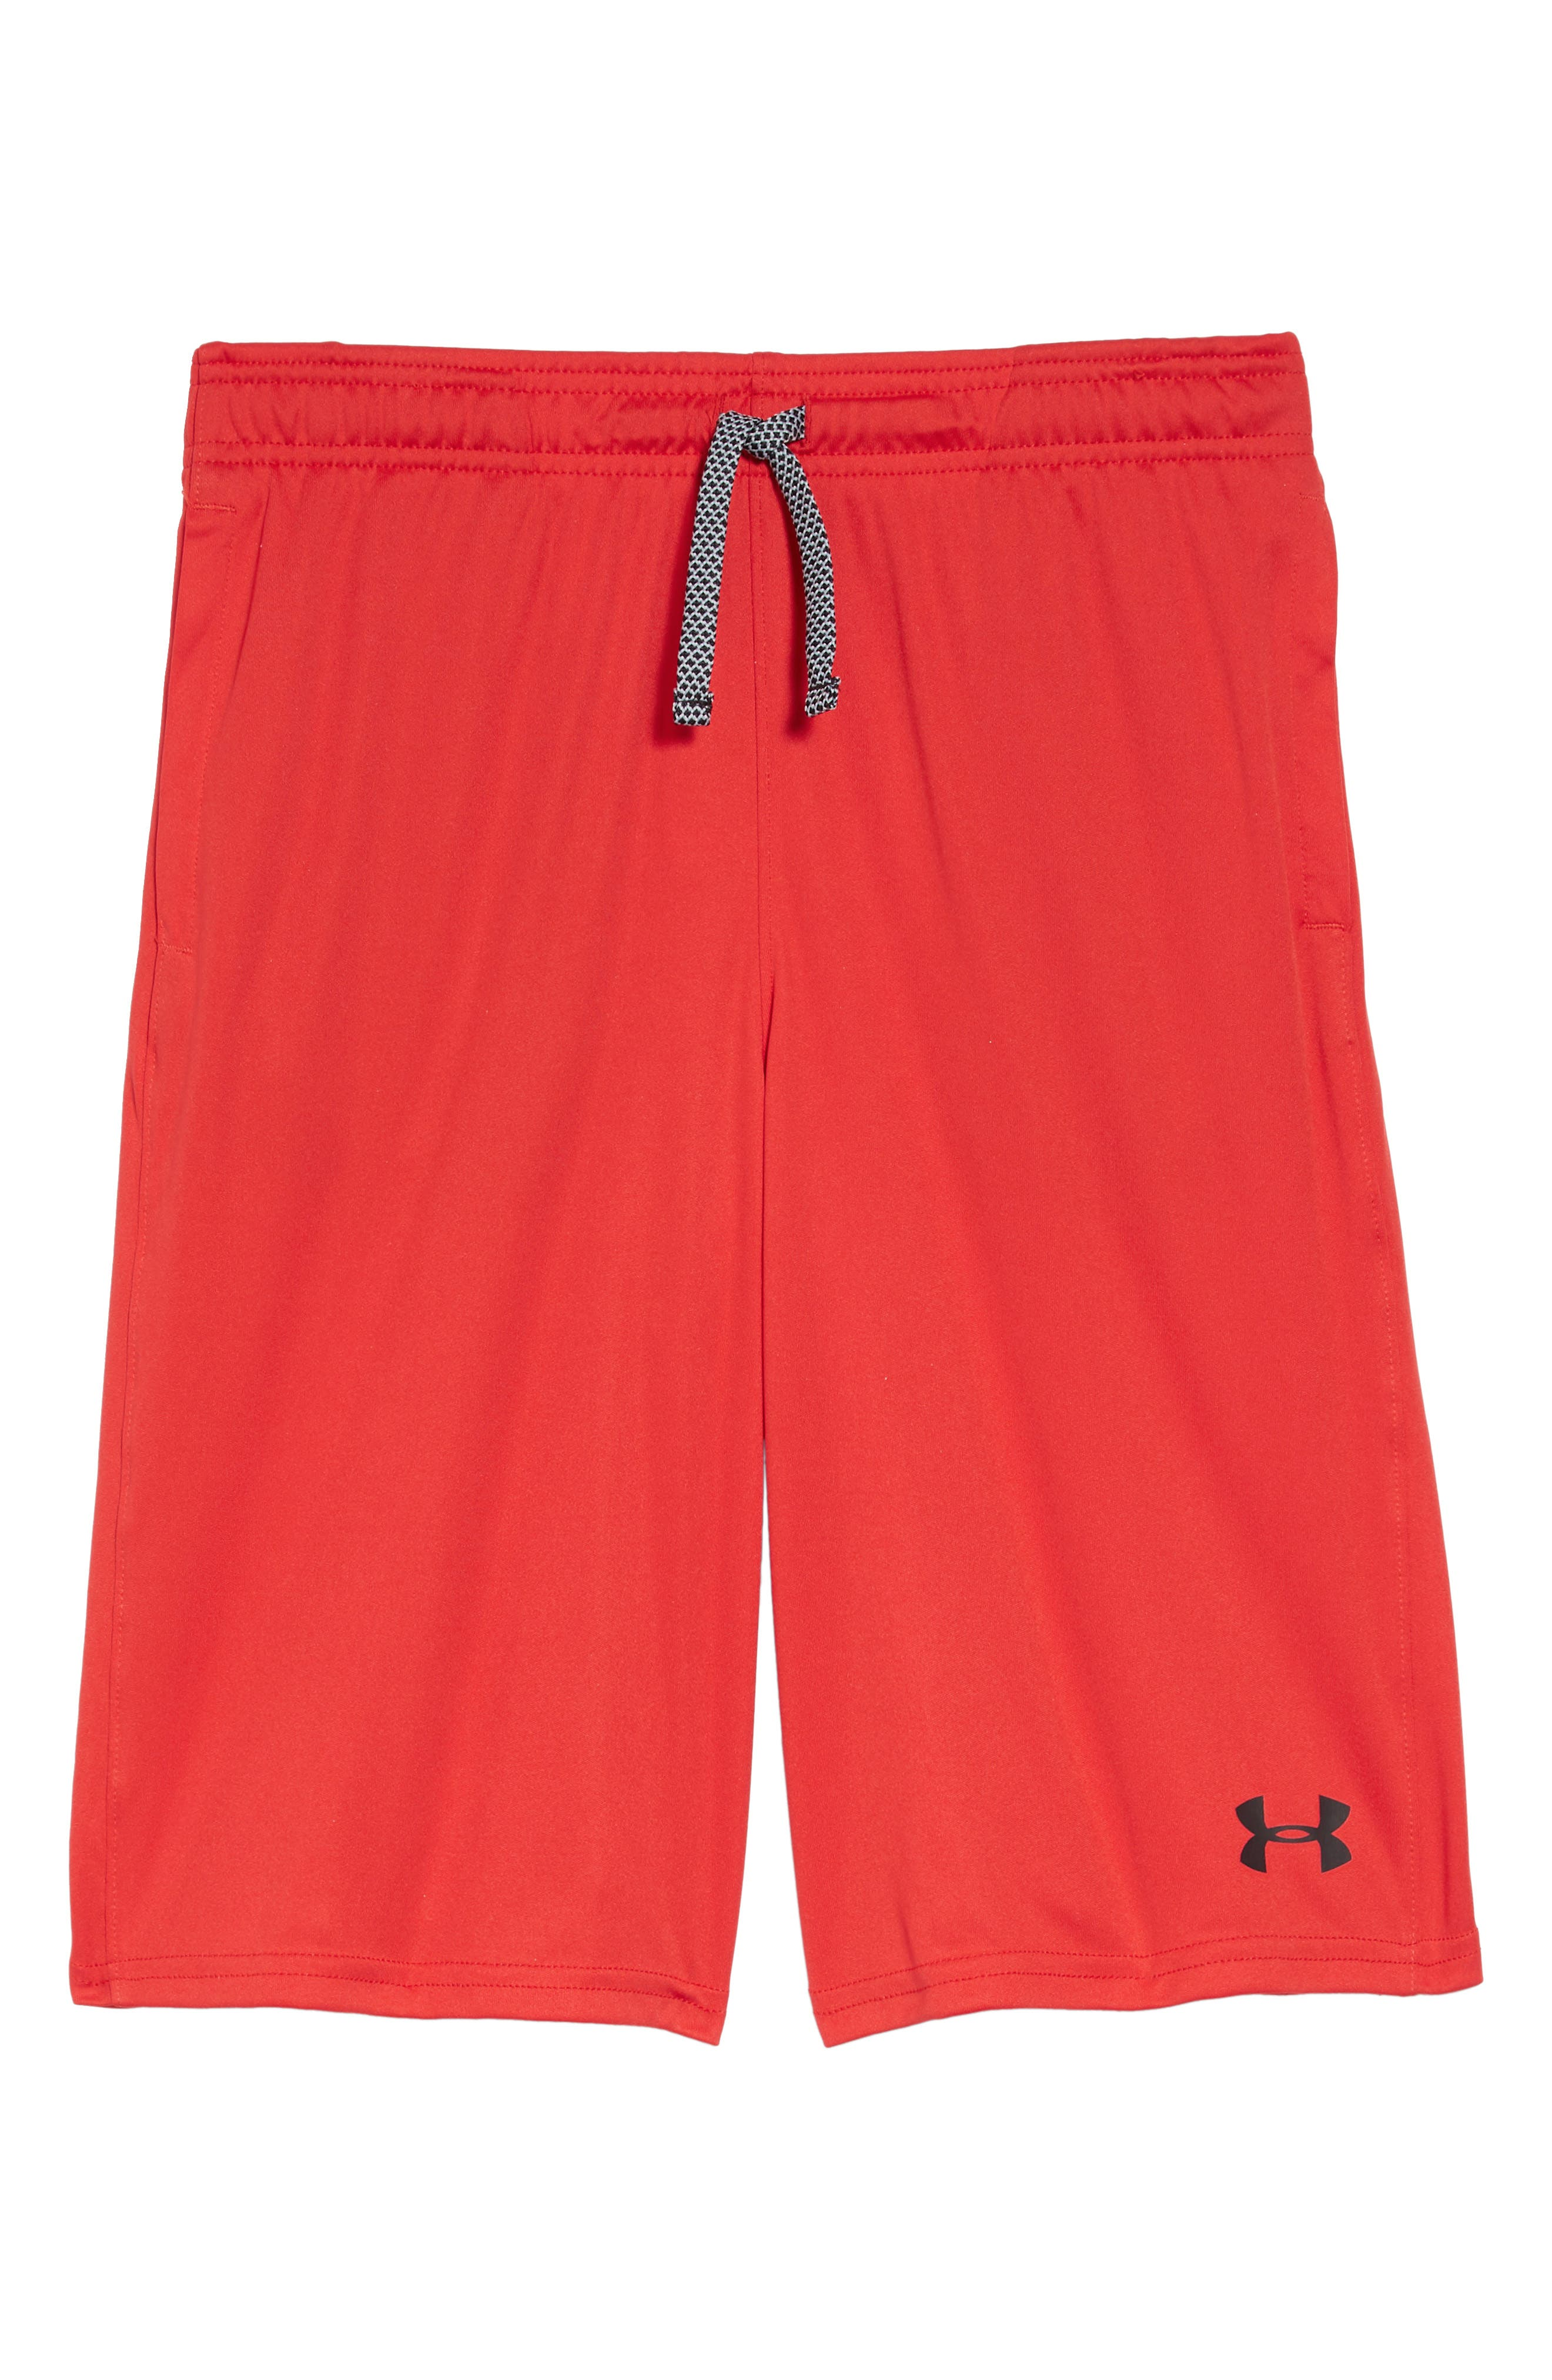 Boys Under Armour Prototype Wordmark Athletic Shorts Size S (8)  Black